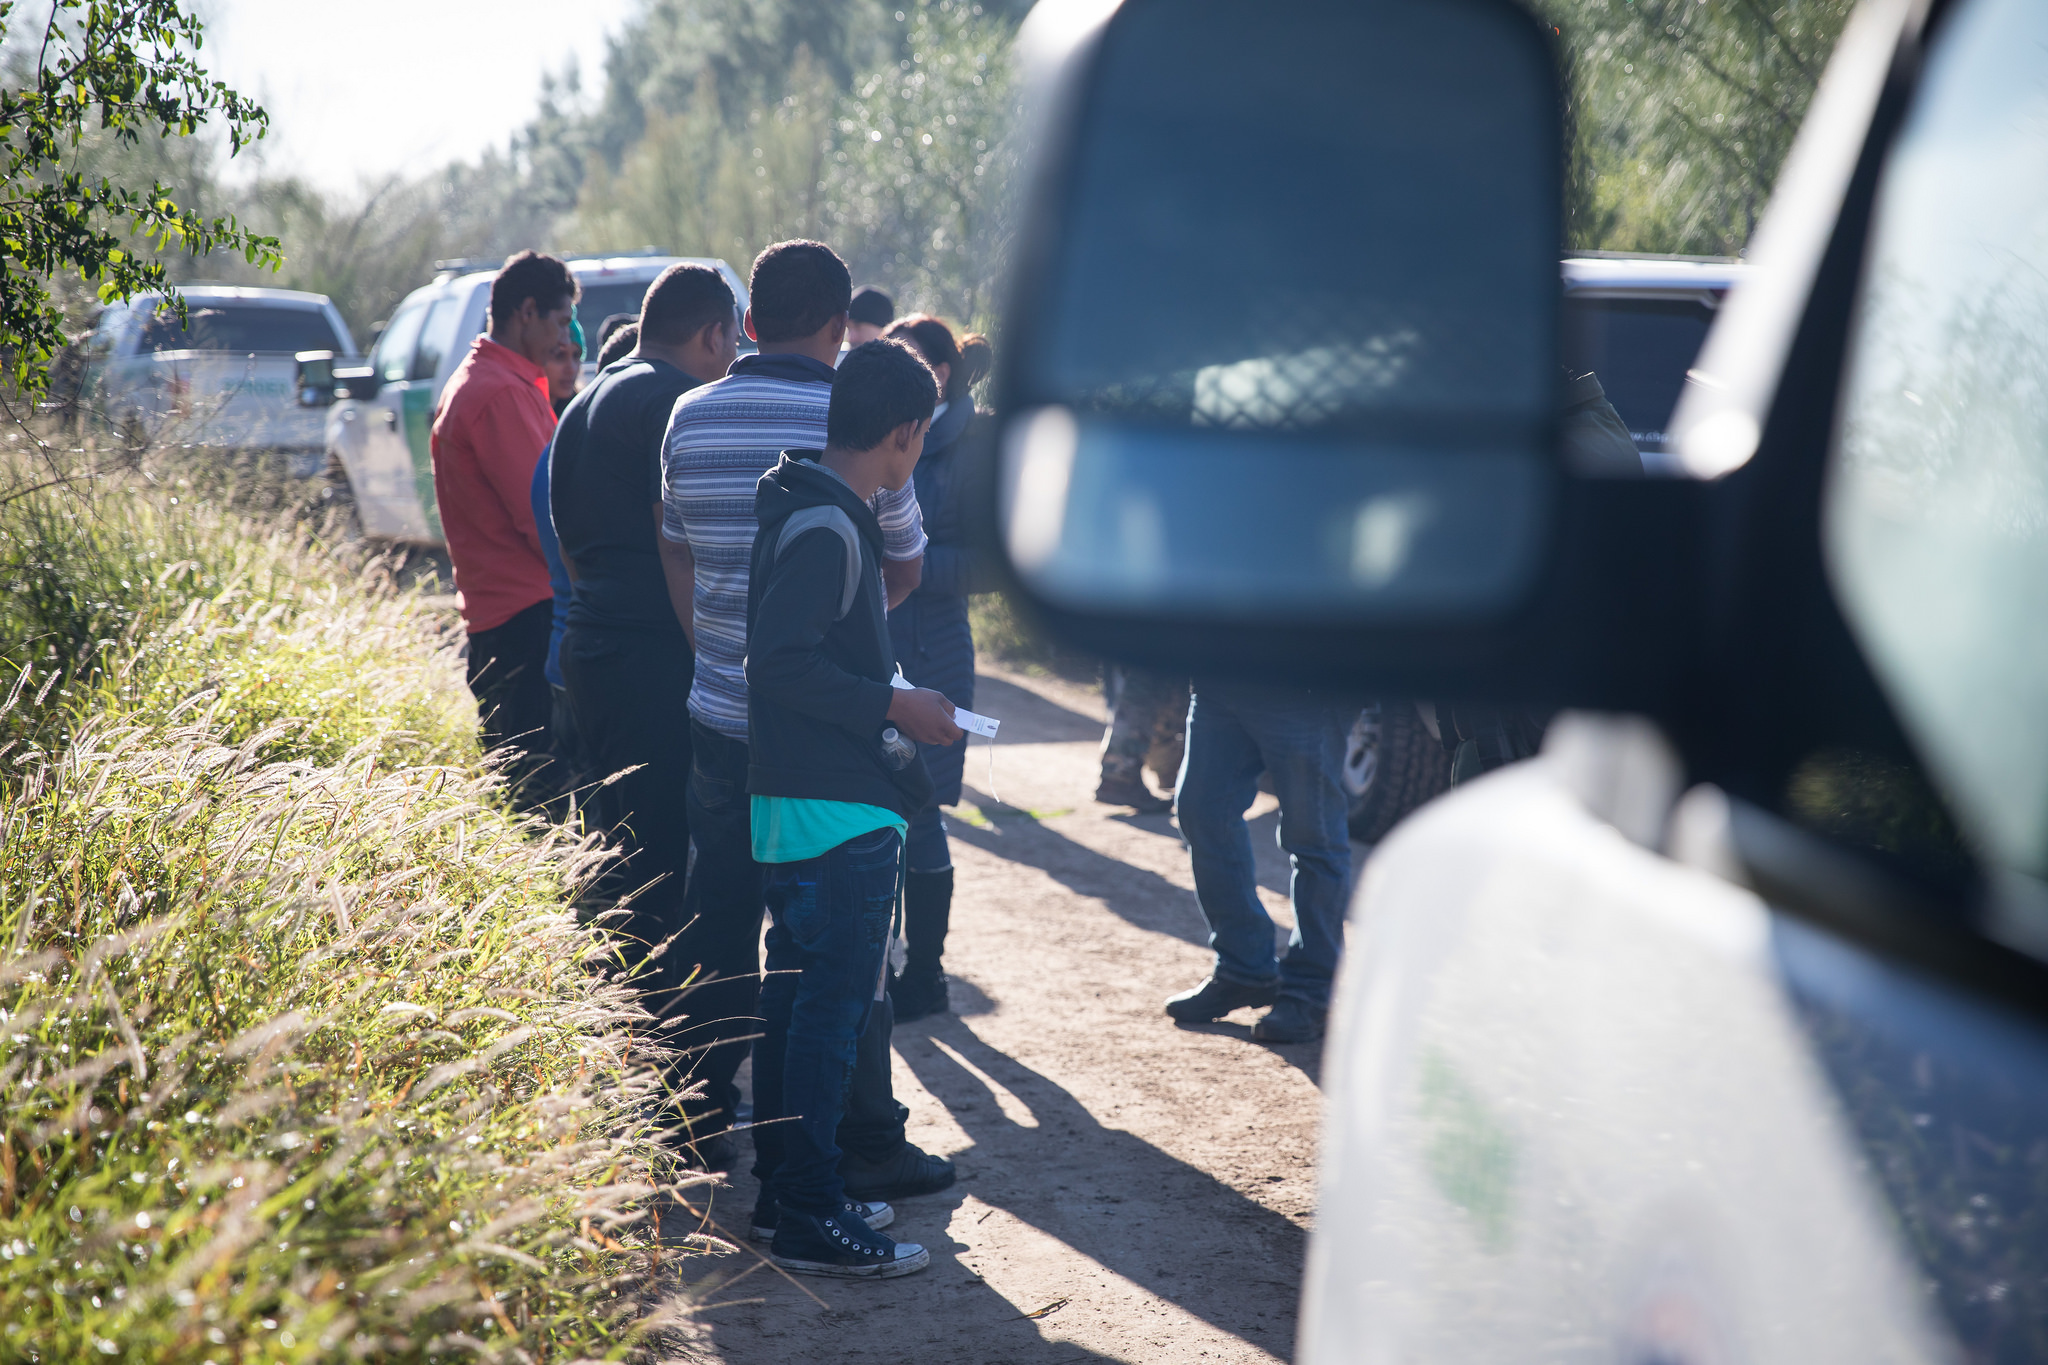 U.S. Border Patrol agents arrest undocumented migrants